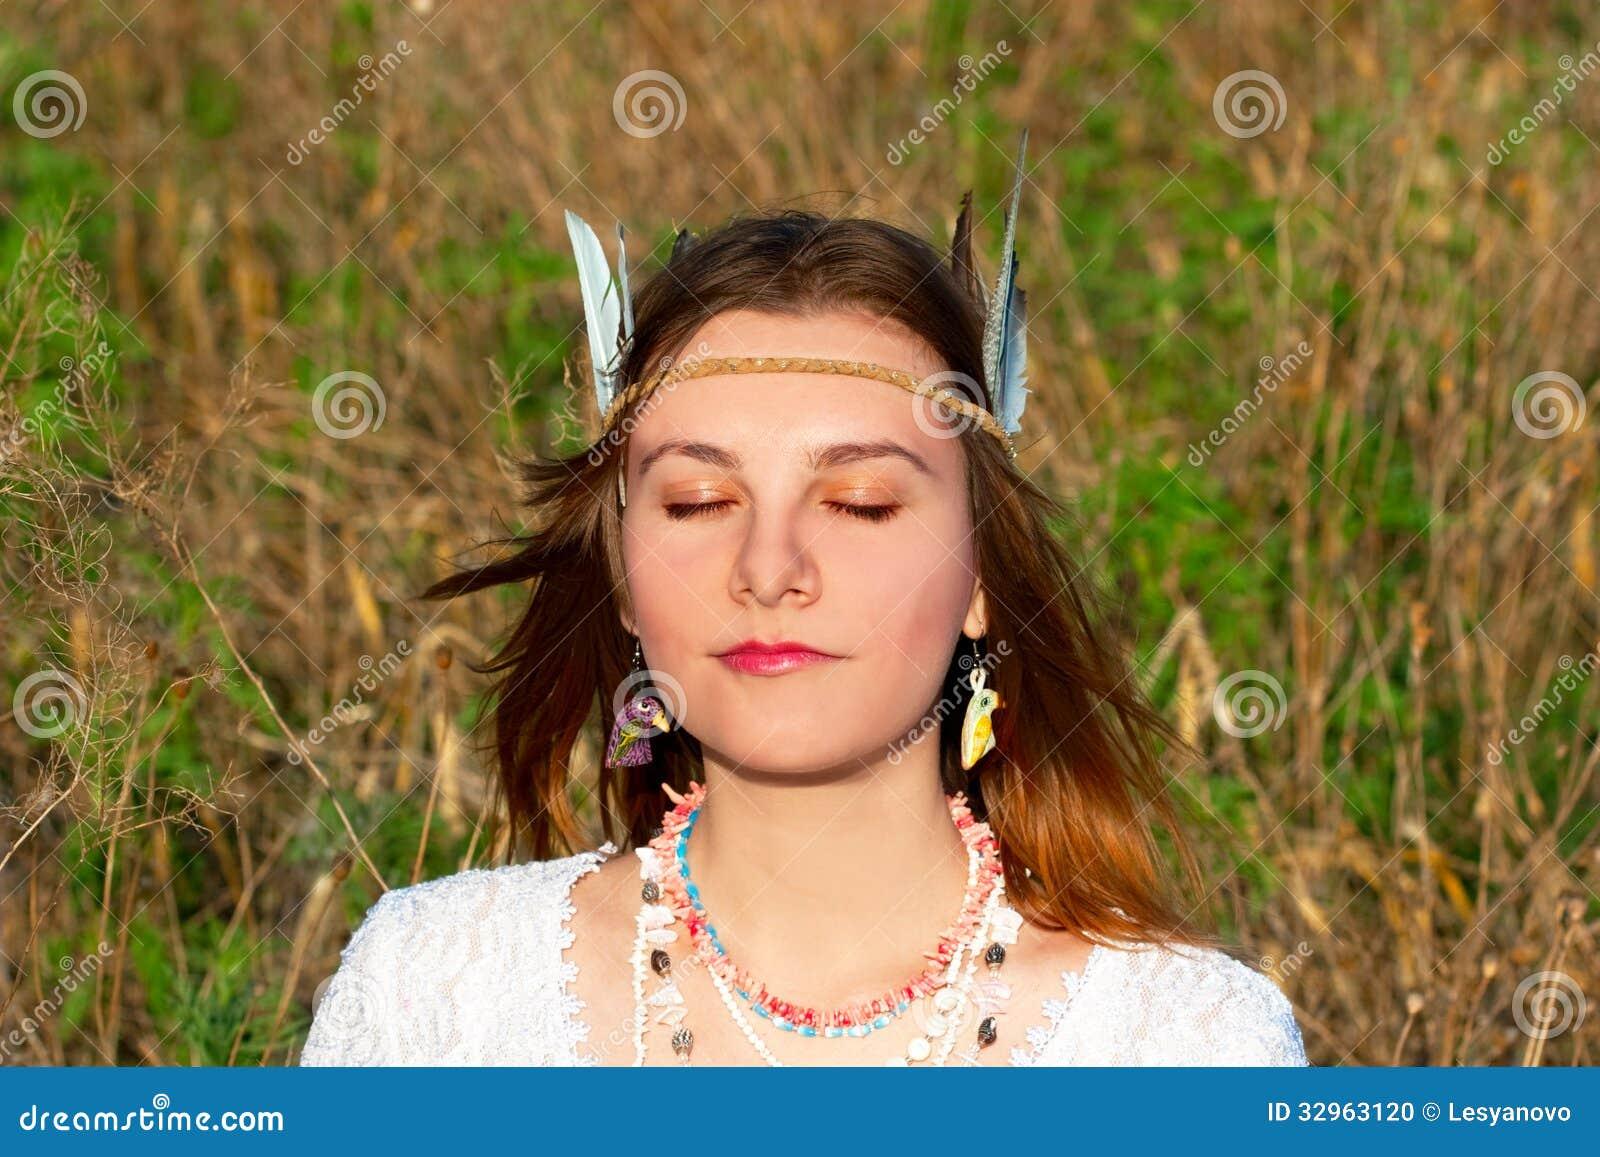 Jovem mulher com beautifications indianos